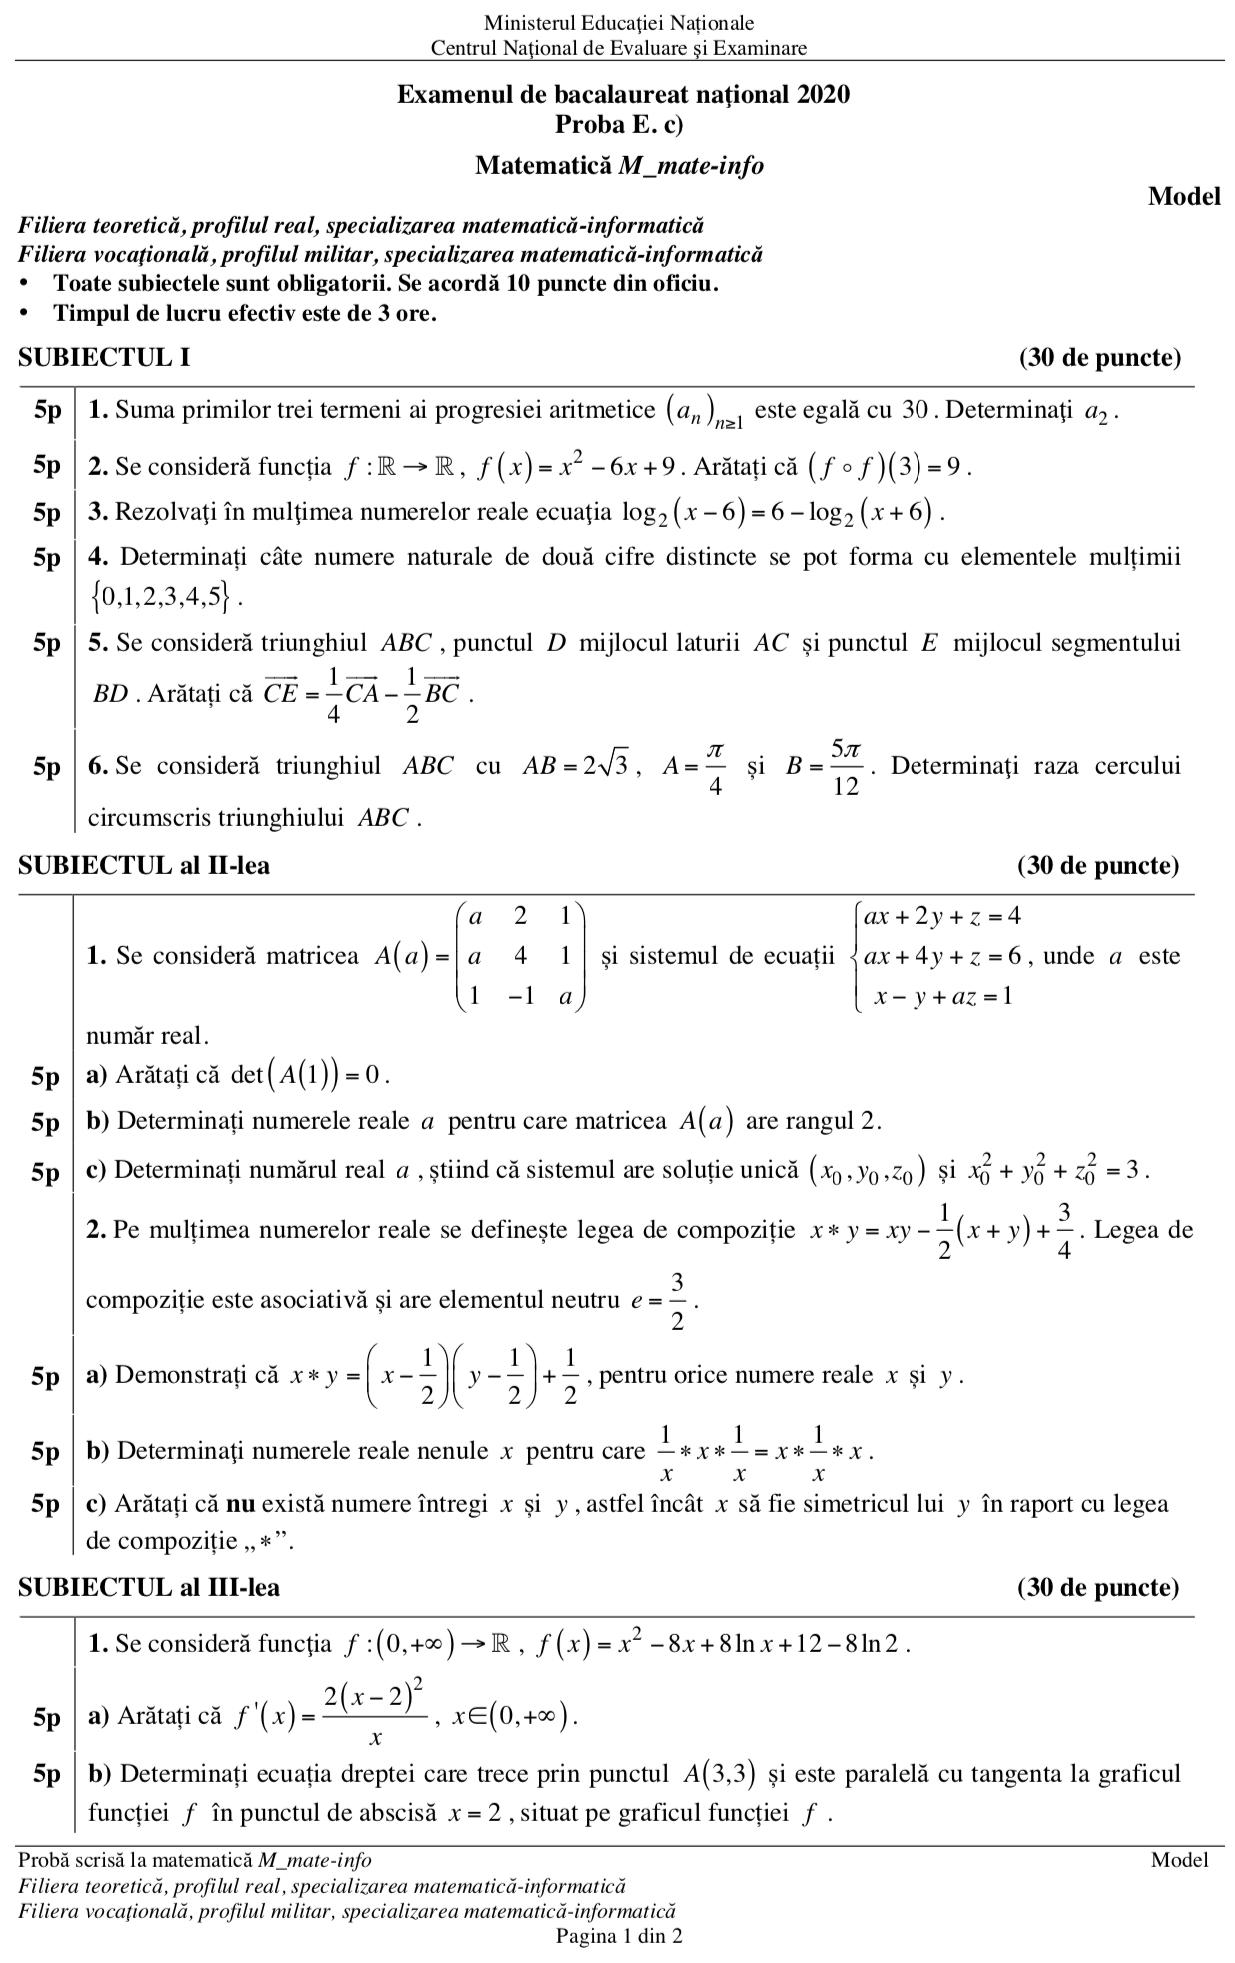 free jakarta forex belajar